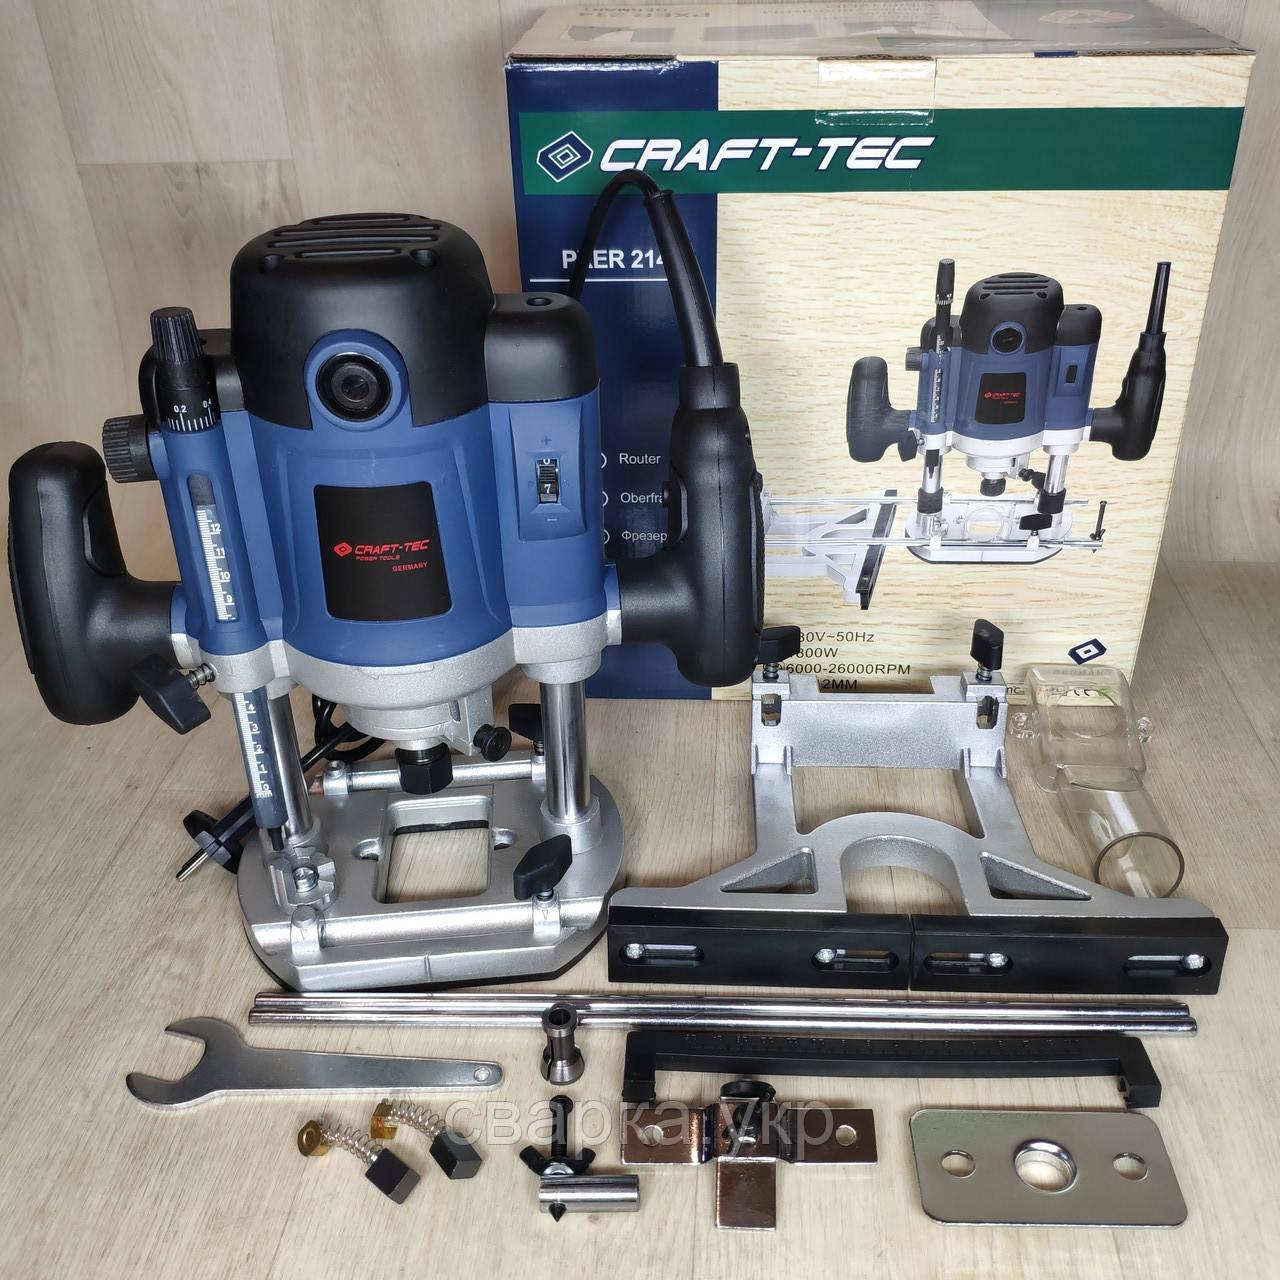 Фрезер Craft-tec PXER 214 (1800 Вт) под 8 и 12 мм цангу